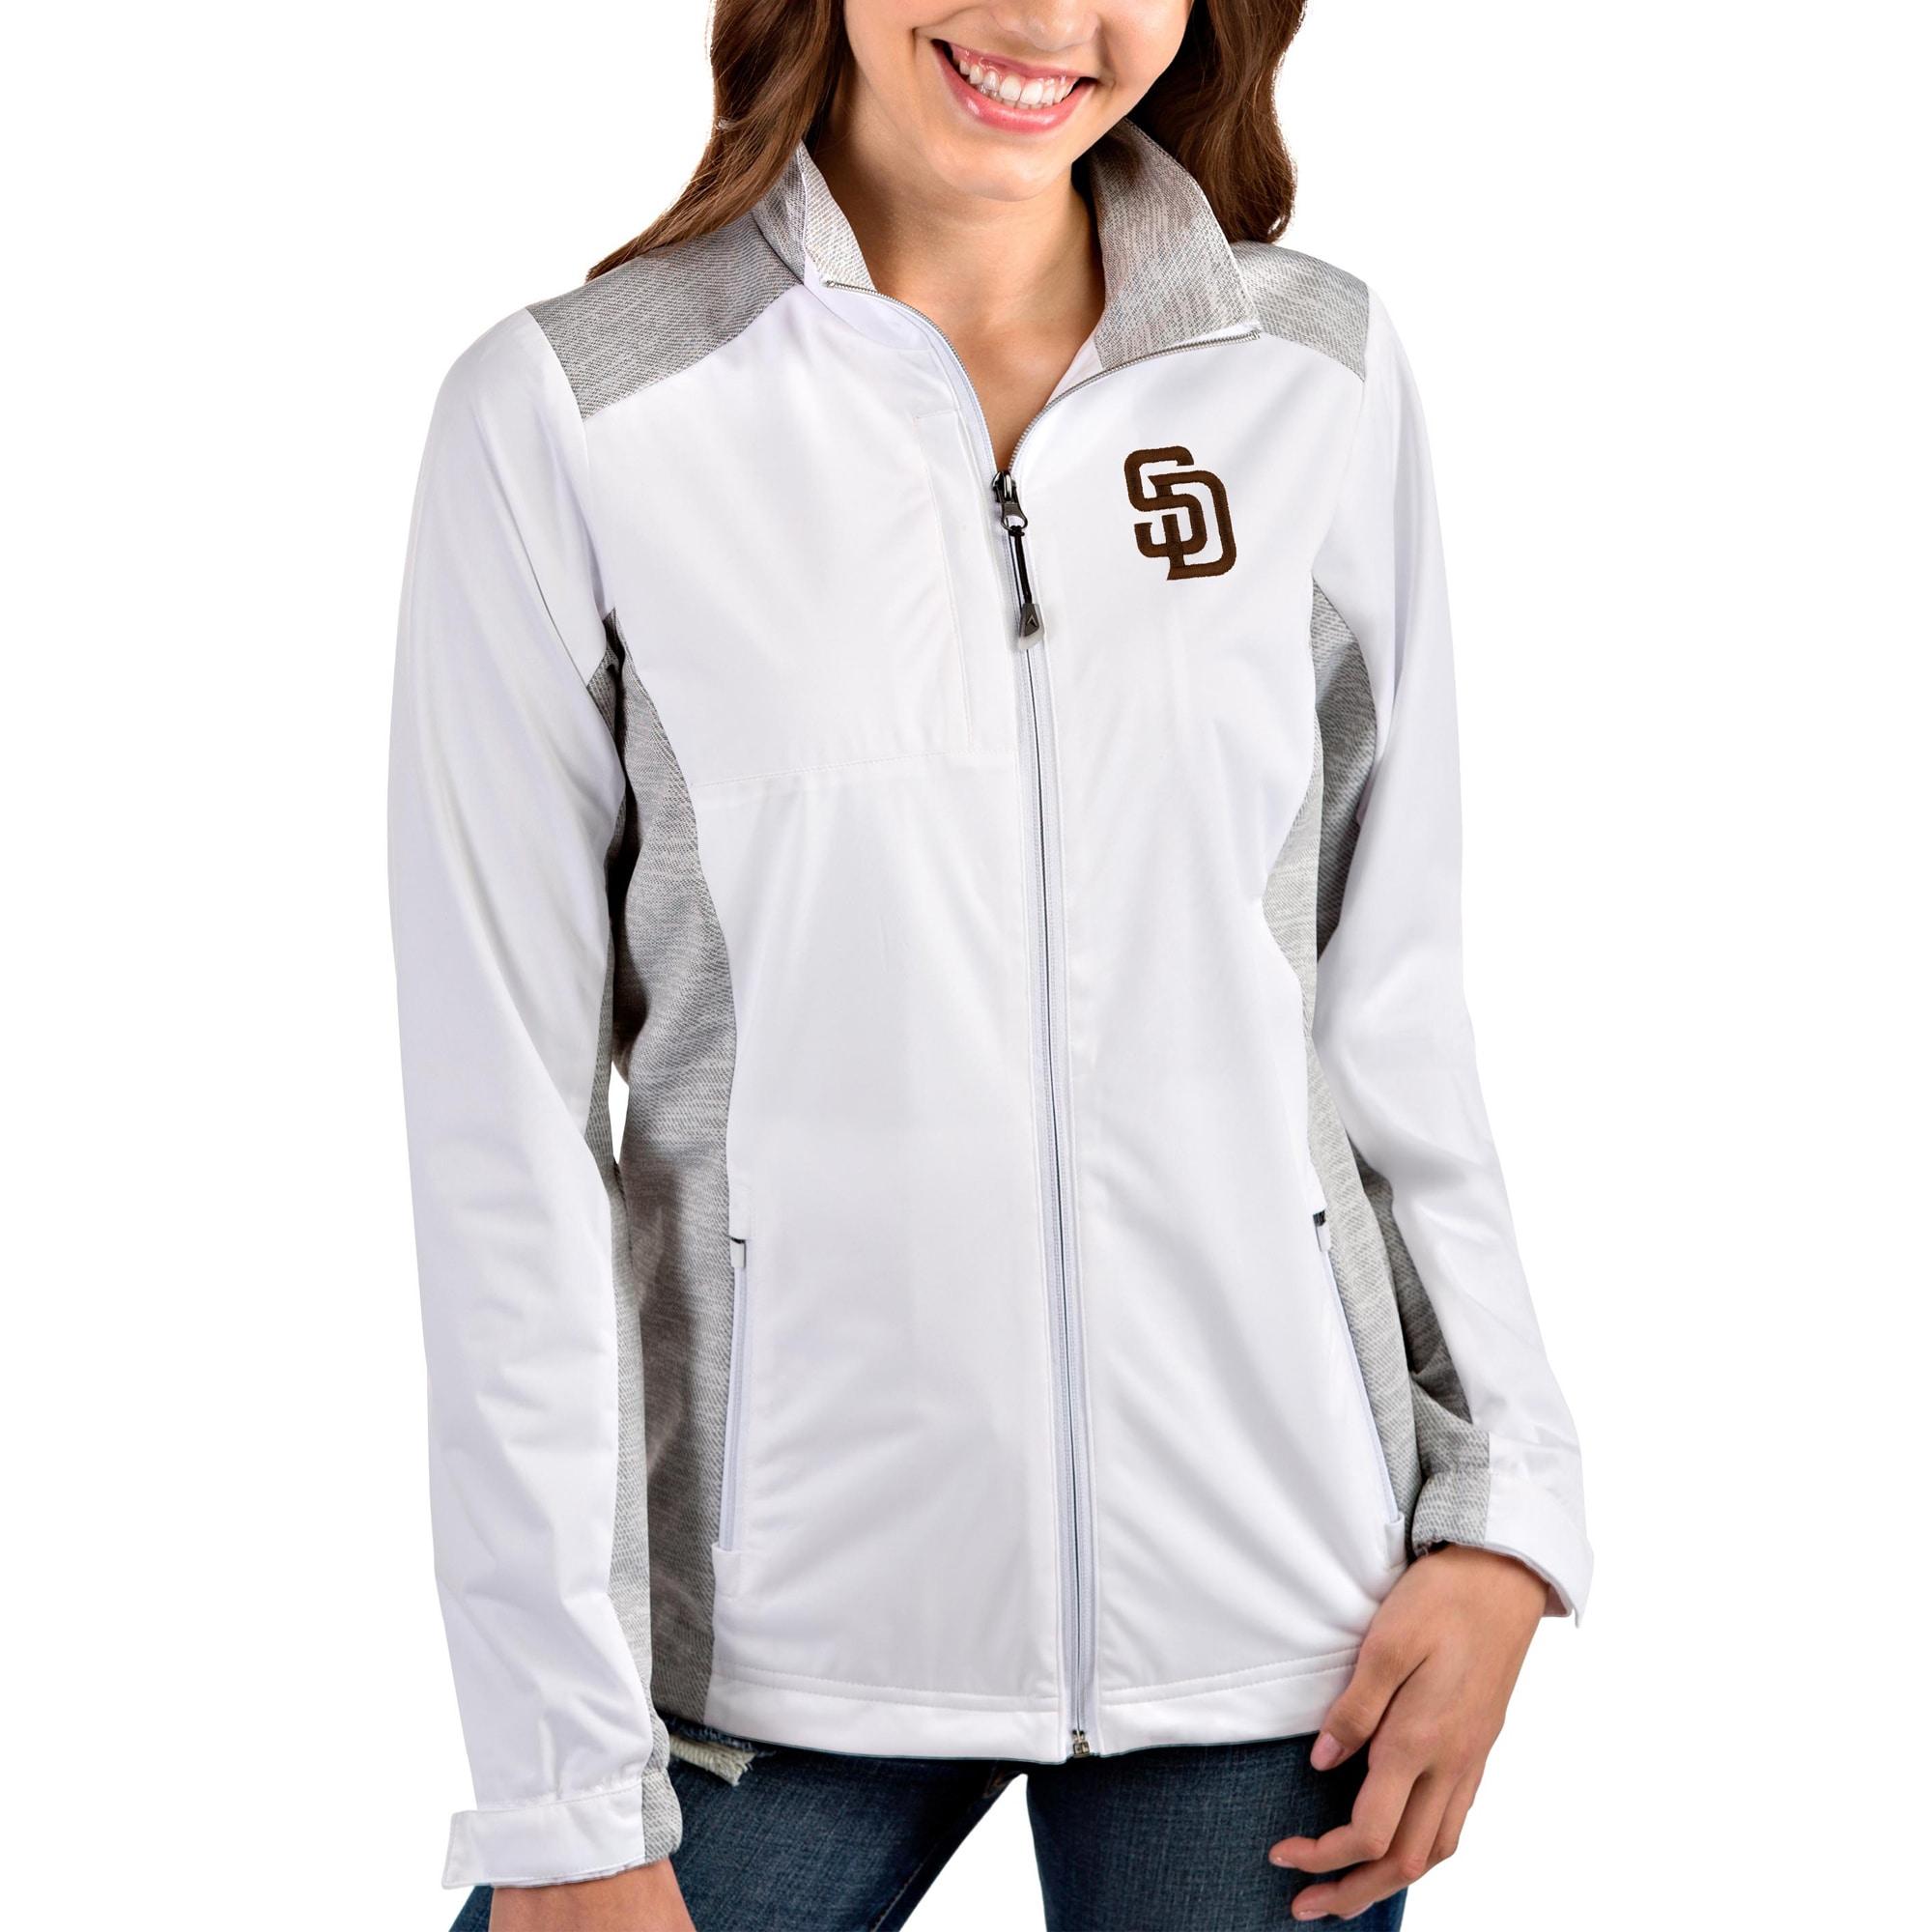 San Diego Padres Antigua Women's Team Revolve Full-Zip Jacket - White